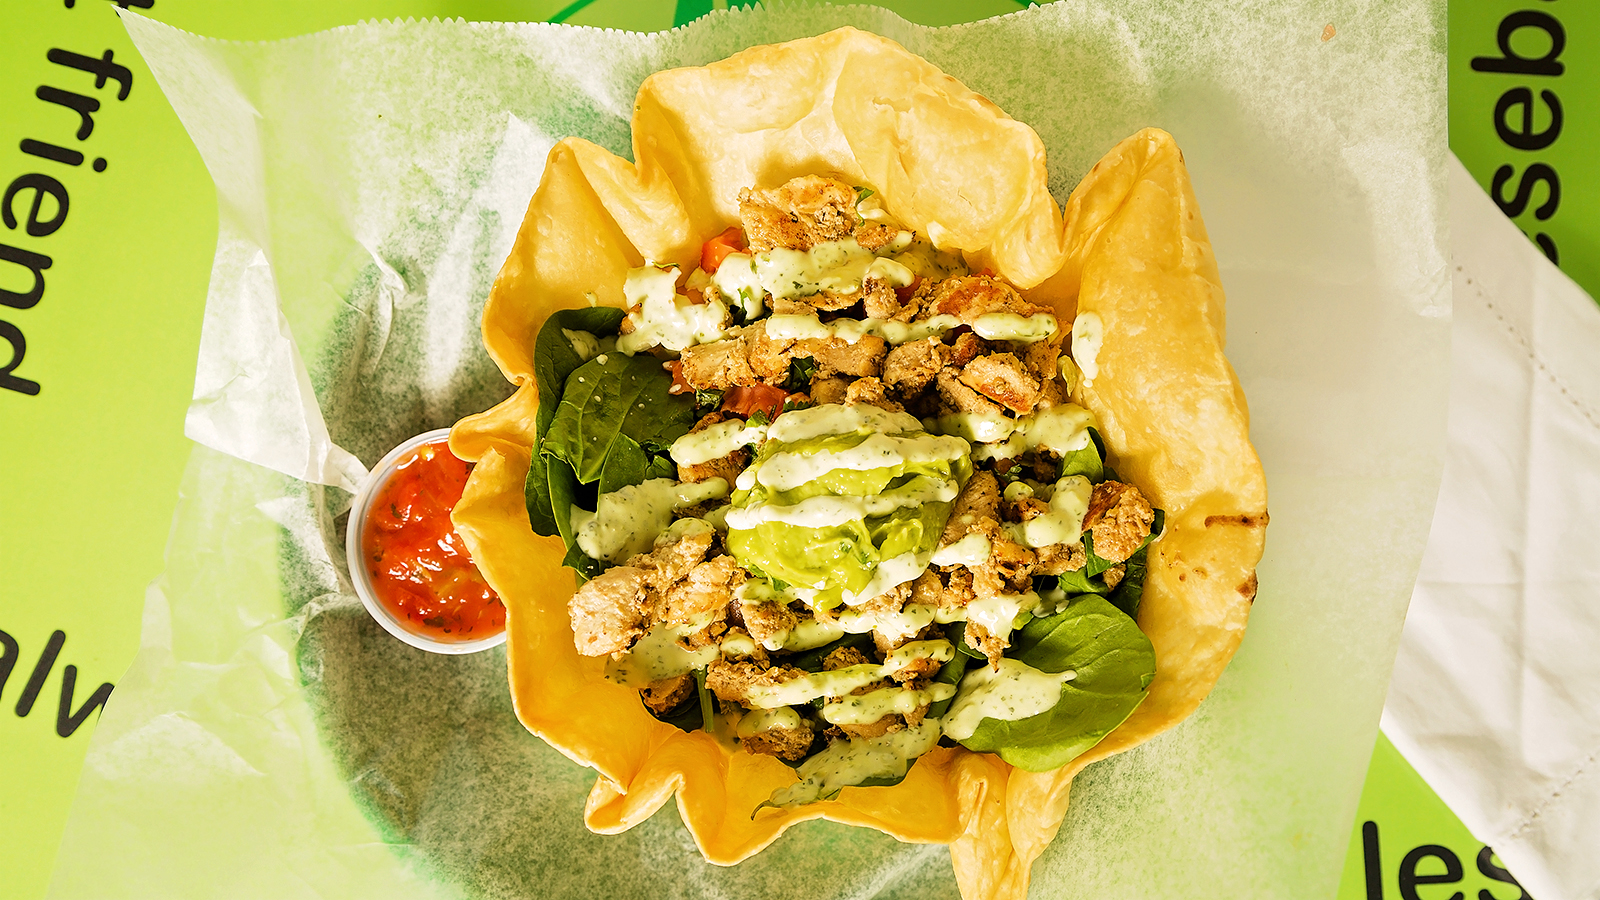 MONDAY - Chicken Salad Bowl $6.50